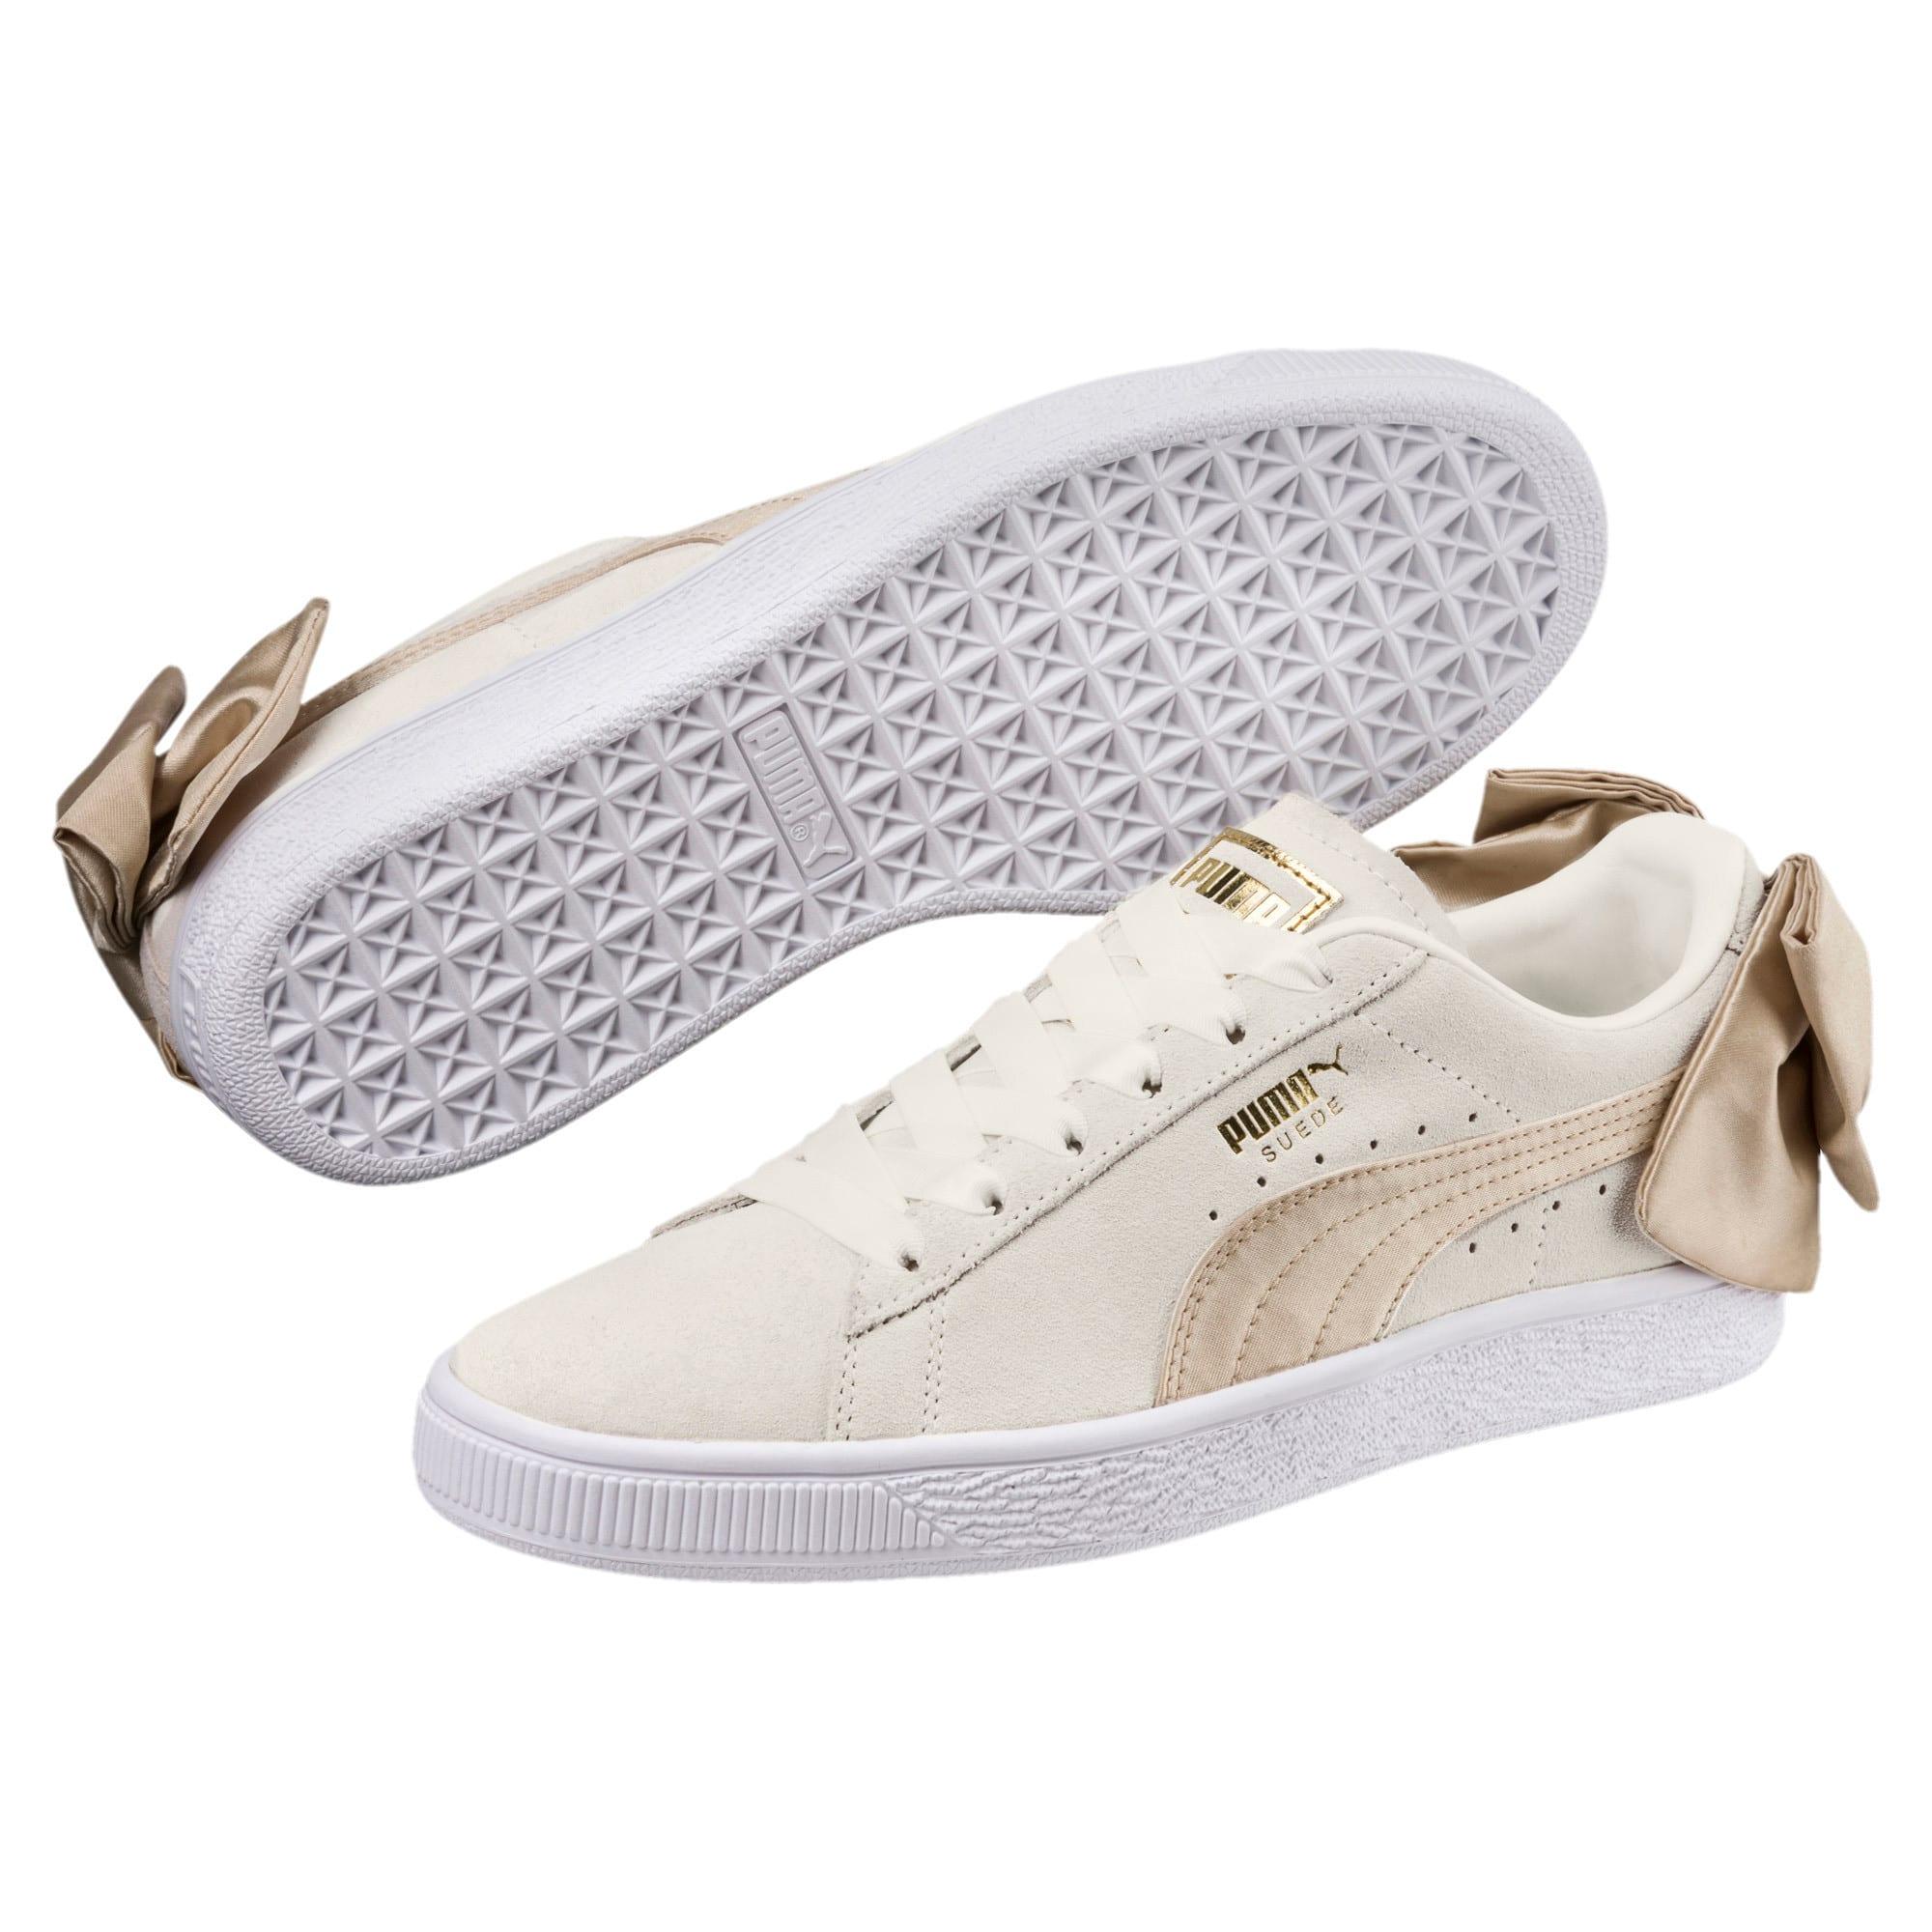 Thumbnail 2 of Suede Bow Varsity Women's Sneakers, Marshmallow-Metallic Gold, medium